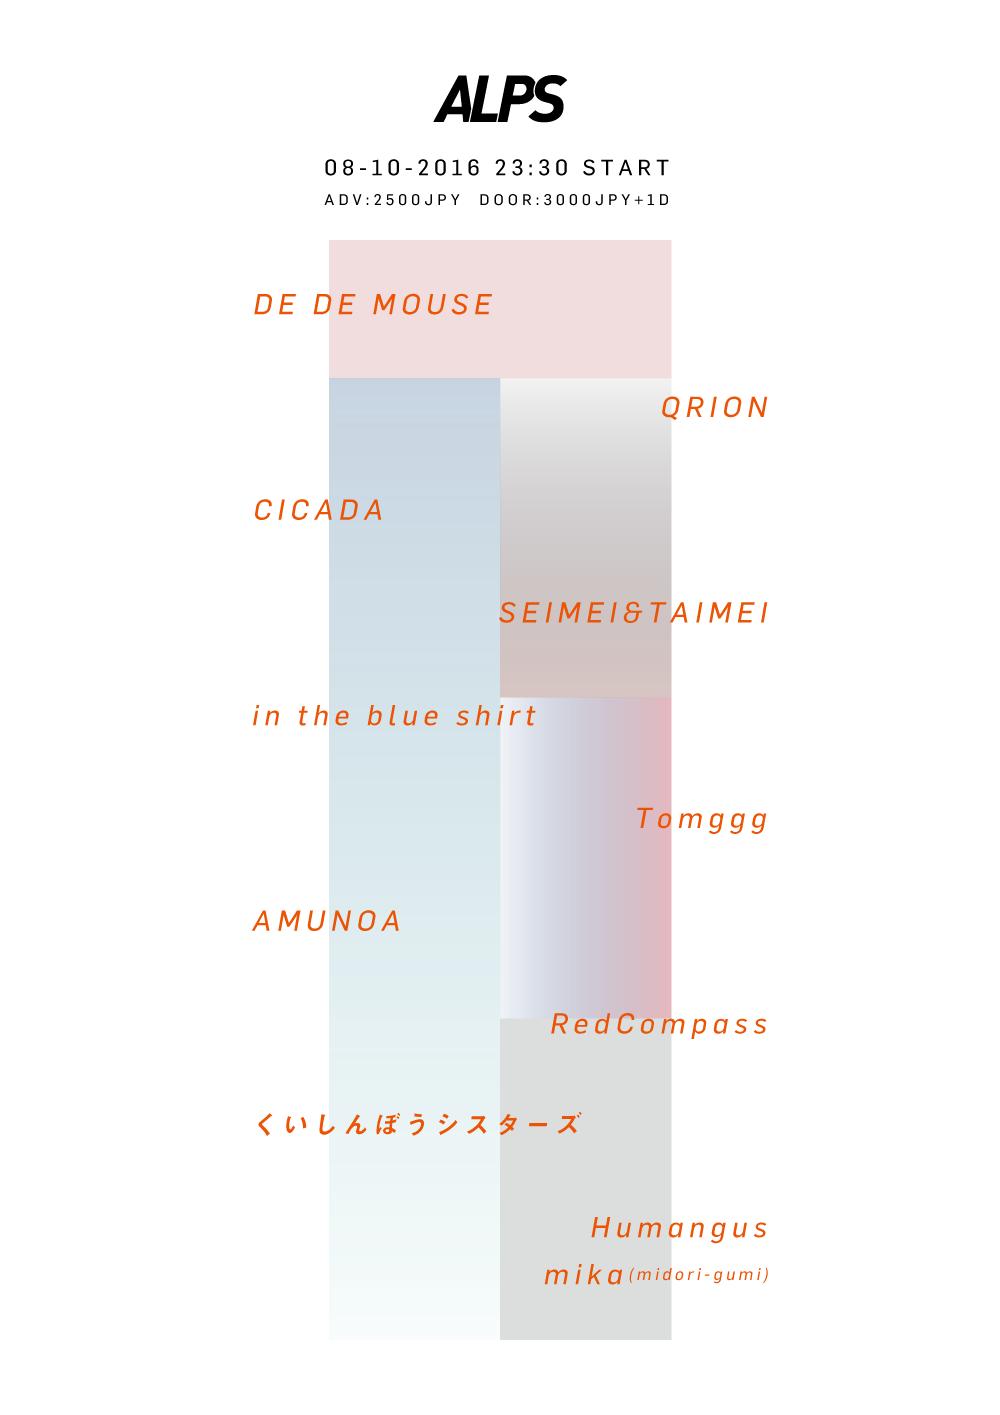 DE DE MOUSE、CICADA、Qrionらが新宿MARZ主催イベントALPSに登場! #ALPS0810 alps1